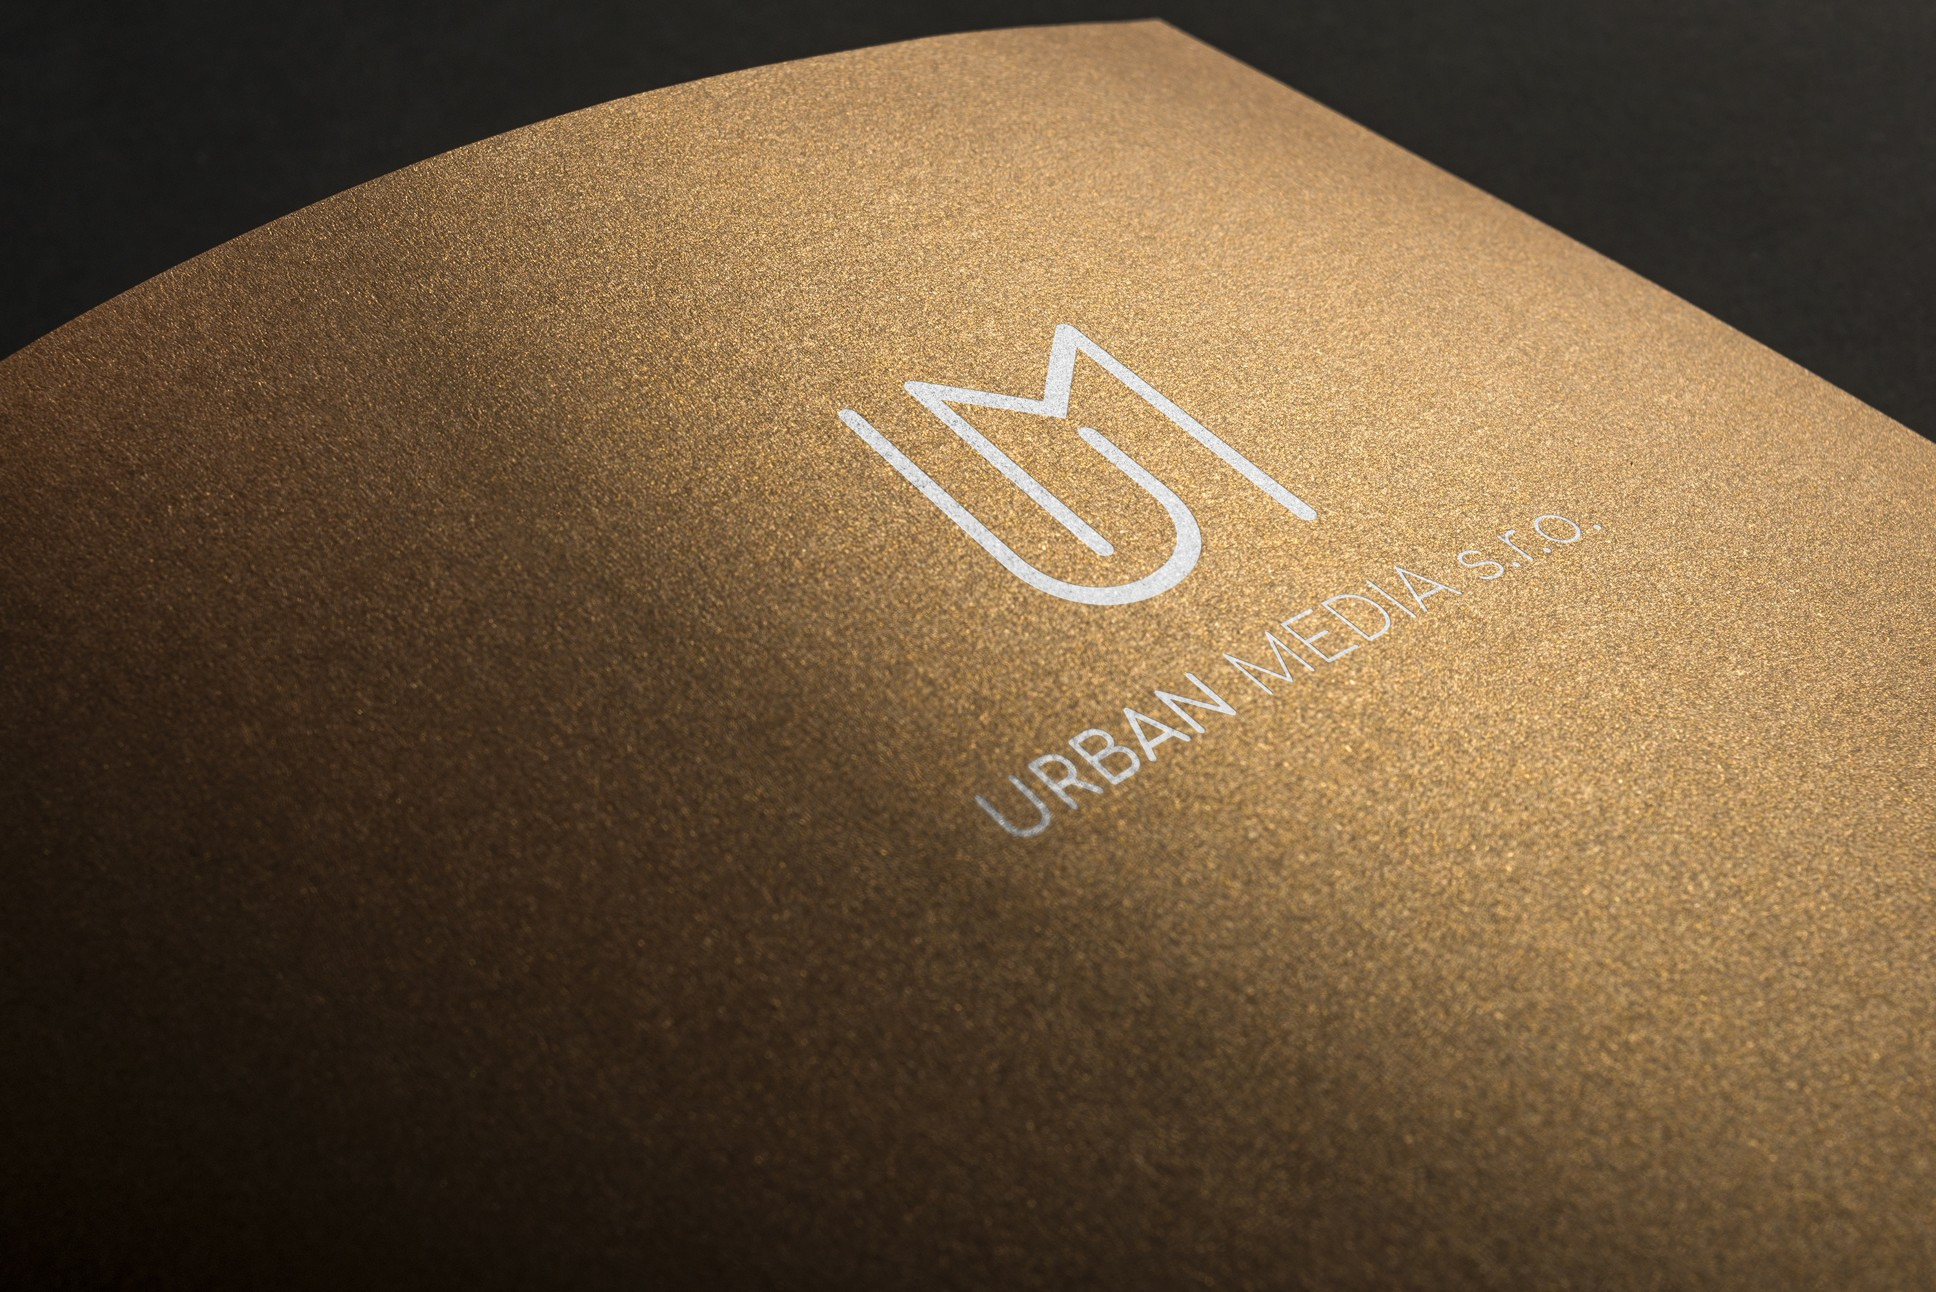 Nové logo - Urban media | VV grafické studio 6